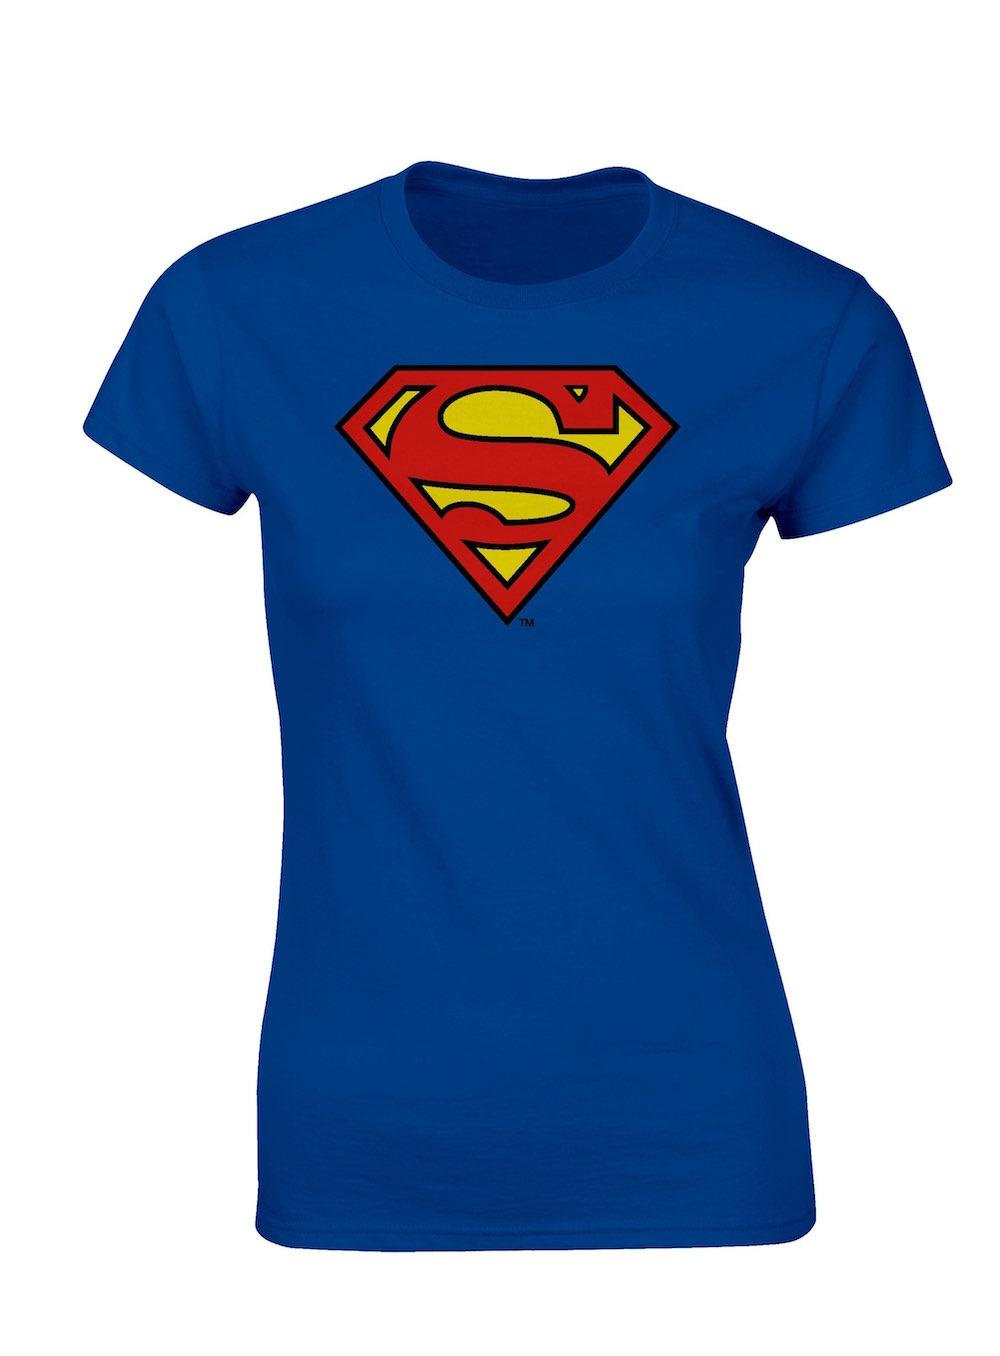 LOGO SUPERMAN CAMISETA AZUL CHICA T-XL DC COMICS